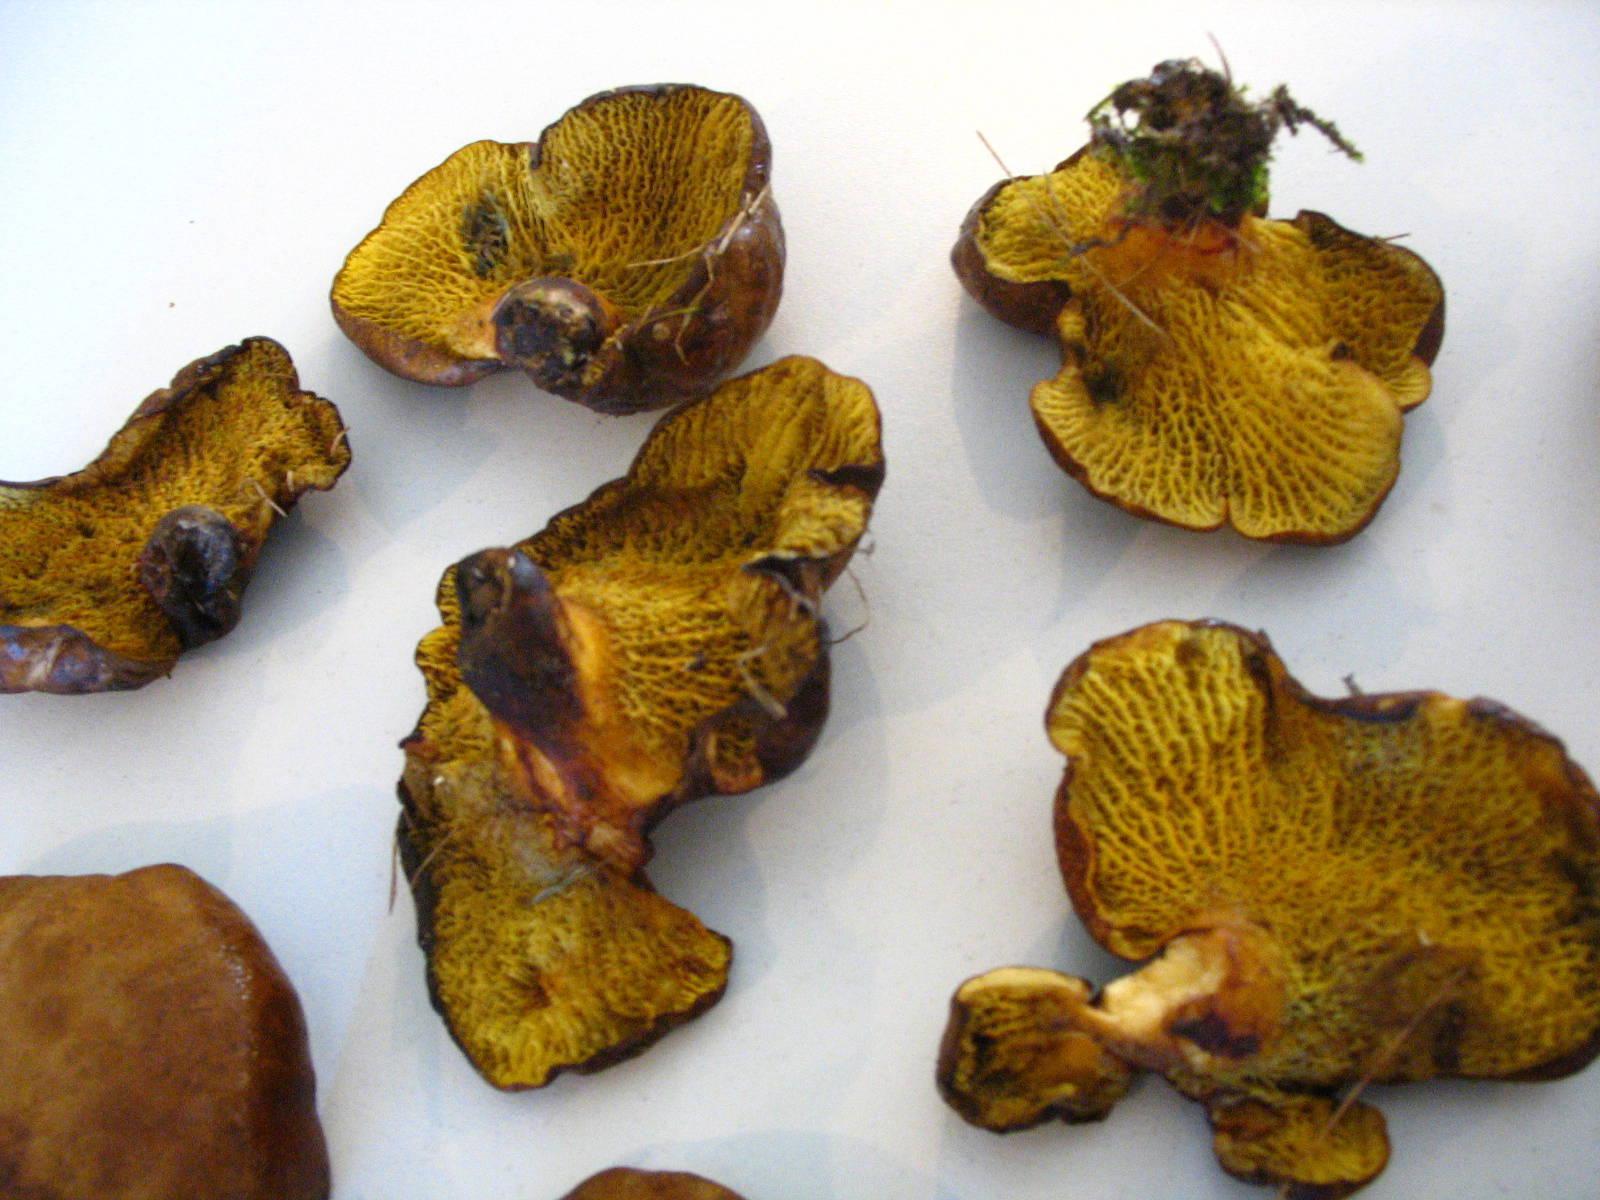 mushrooms in my yard, edible Gyrodon merulioides or ...